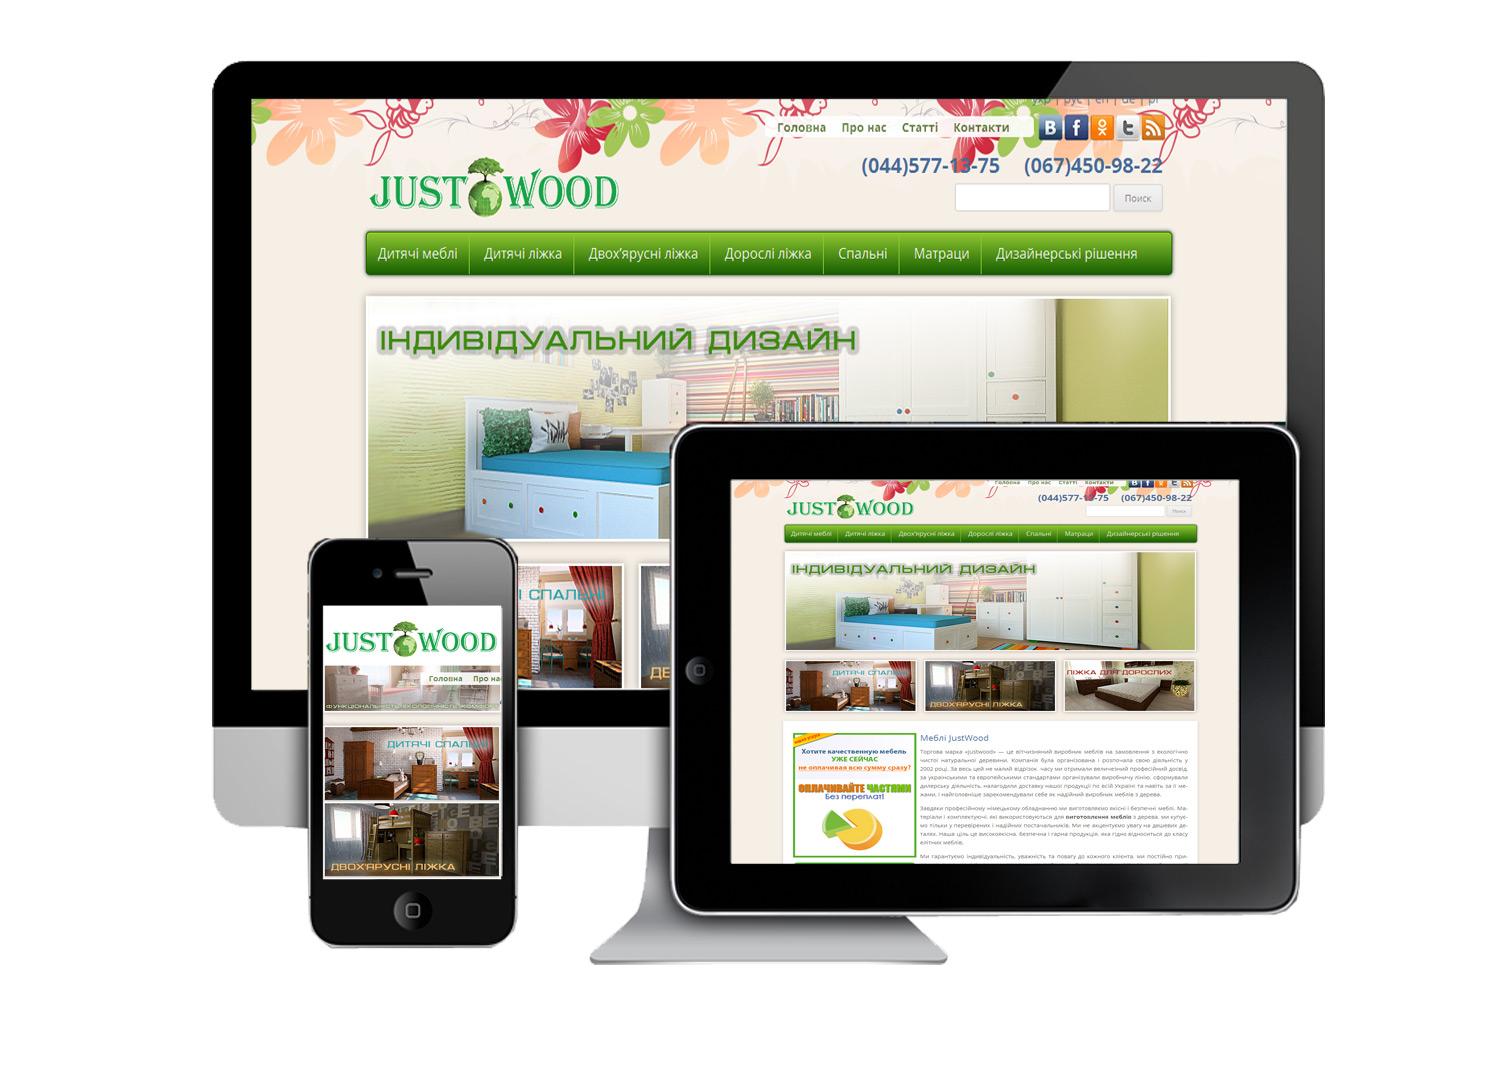 Justwood – Мебель